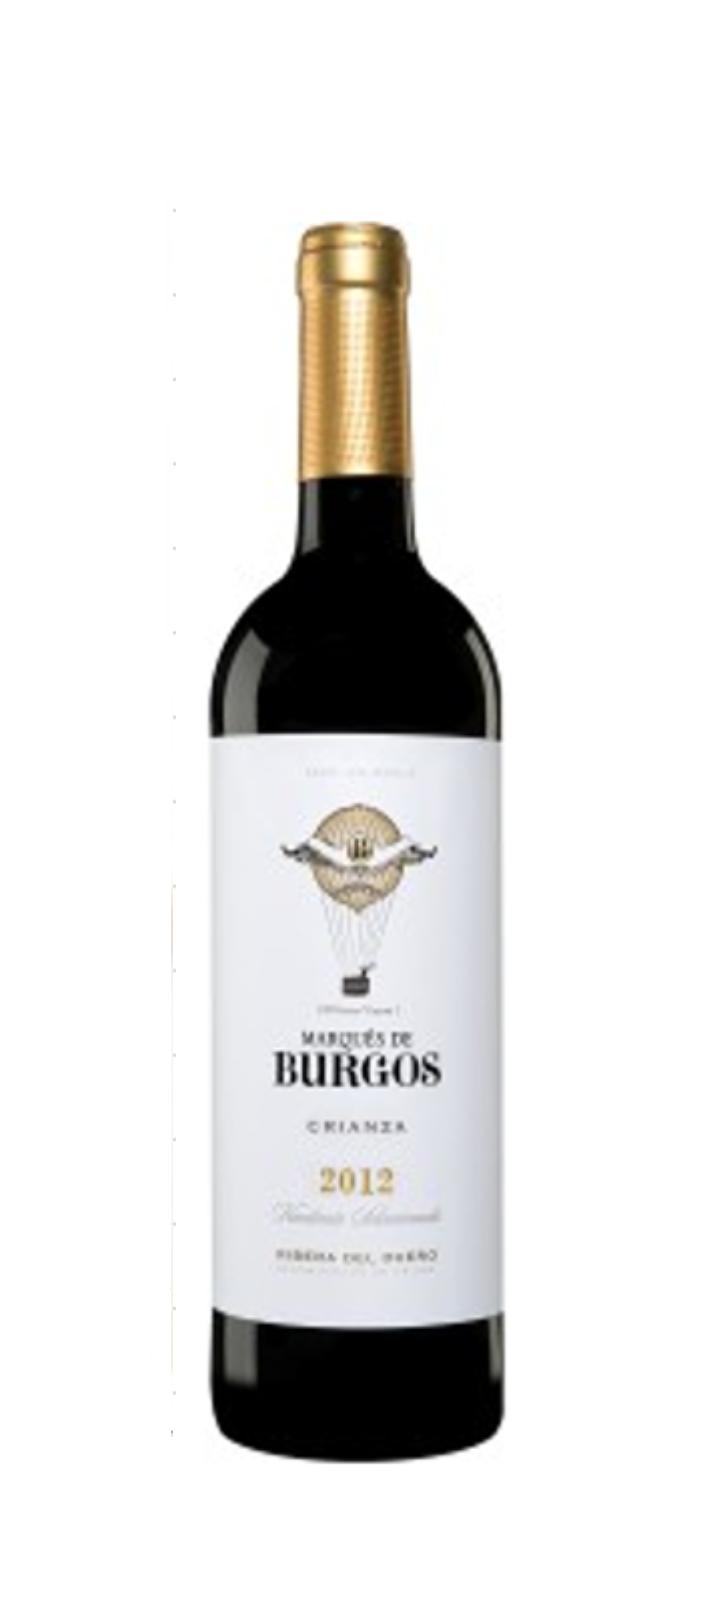 BURGOS Roble - 2014 - ROUGE CRIANZA